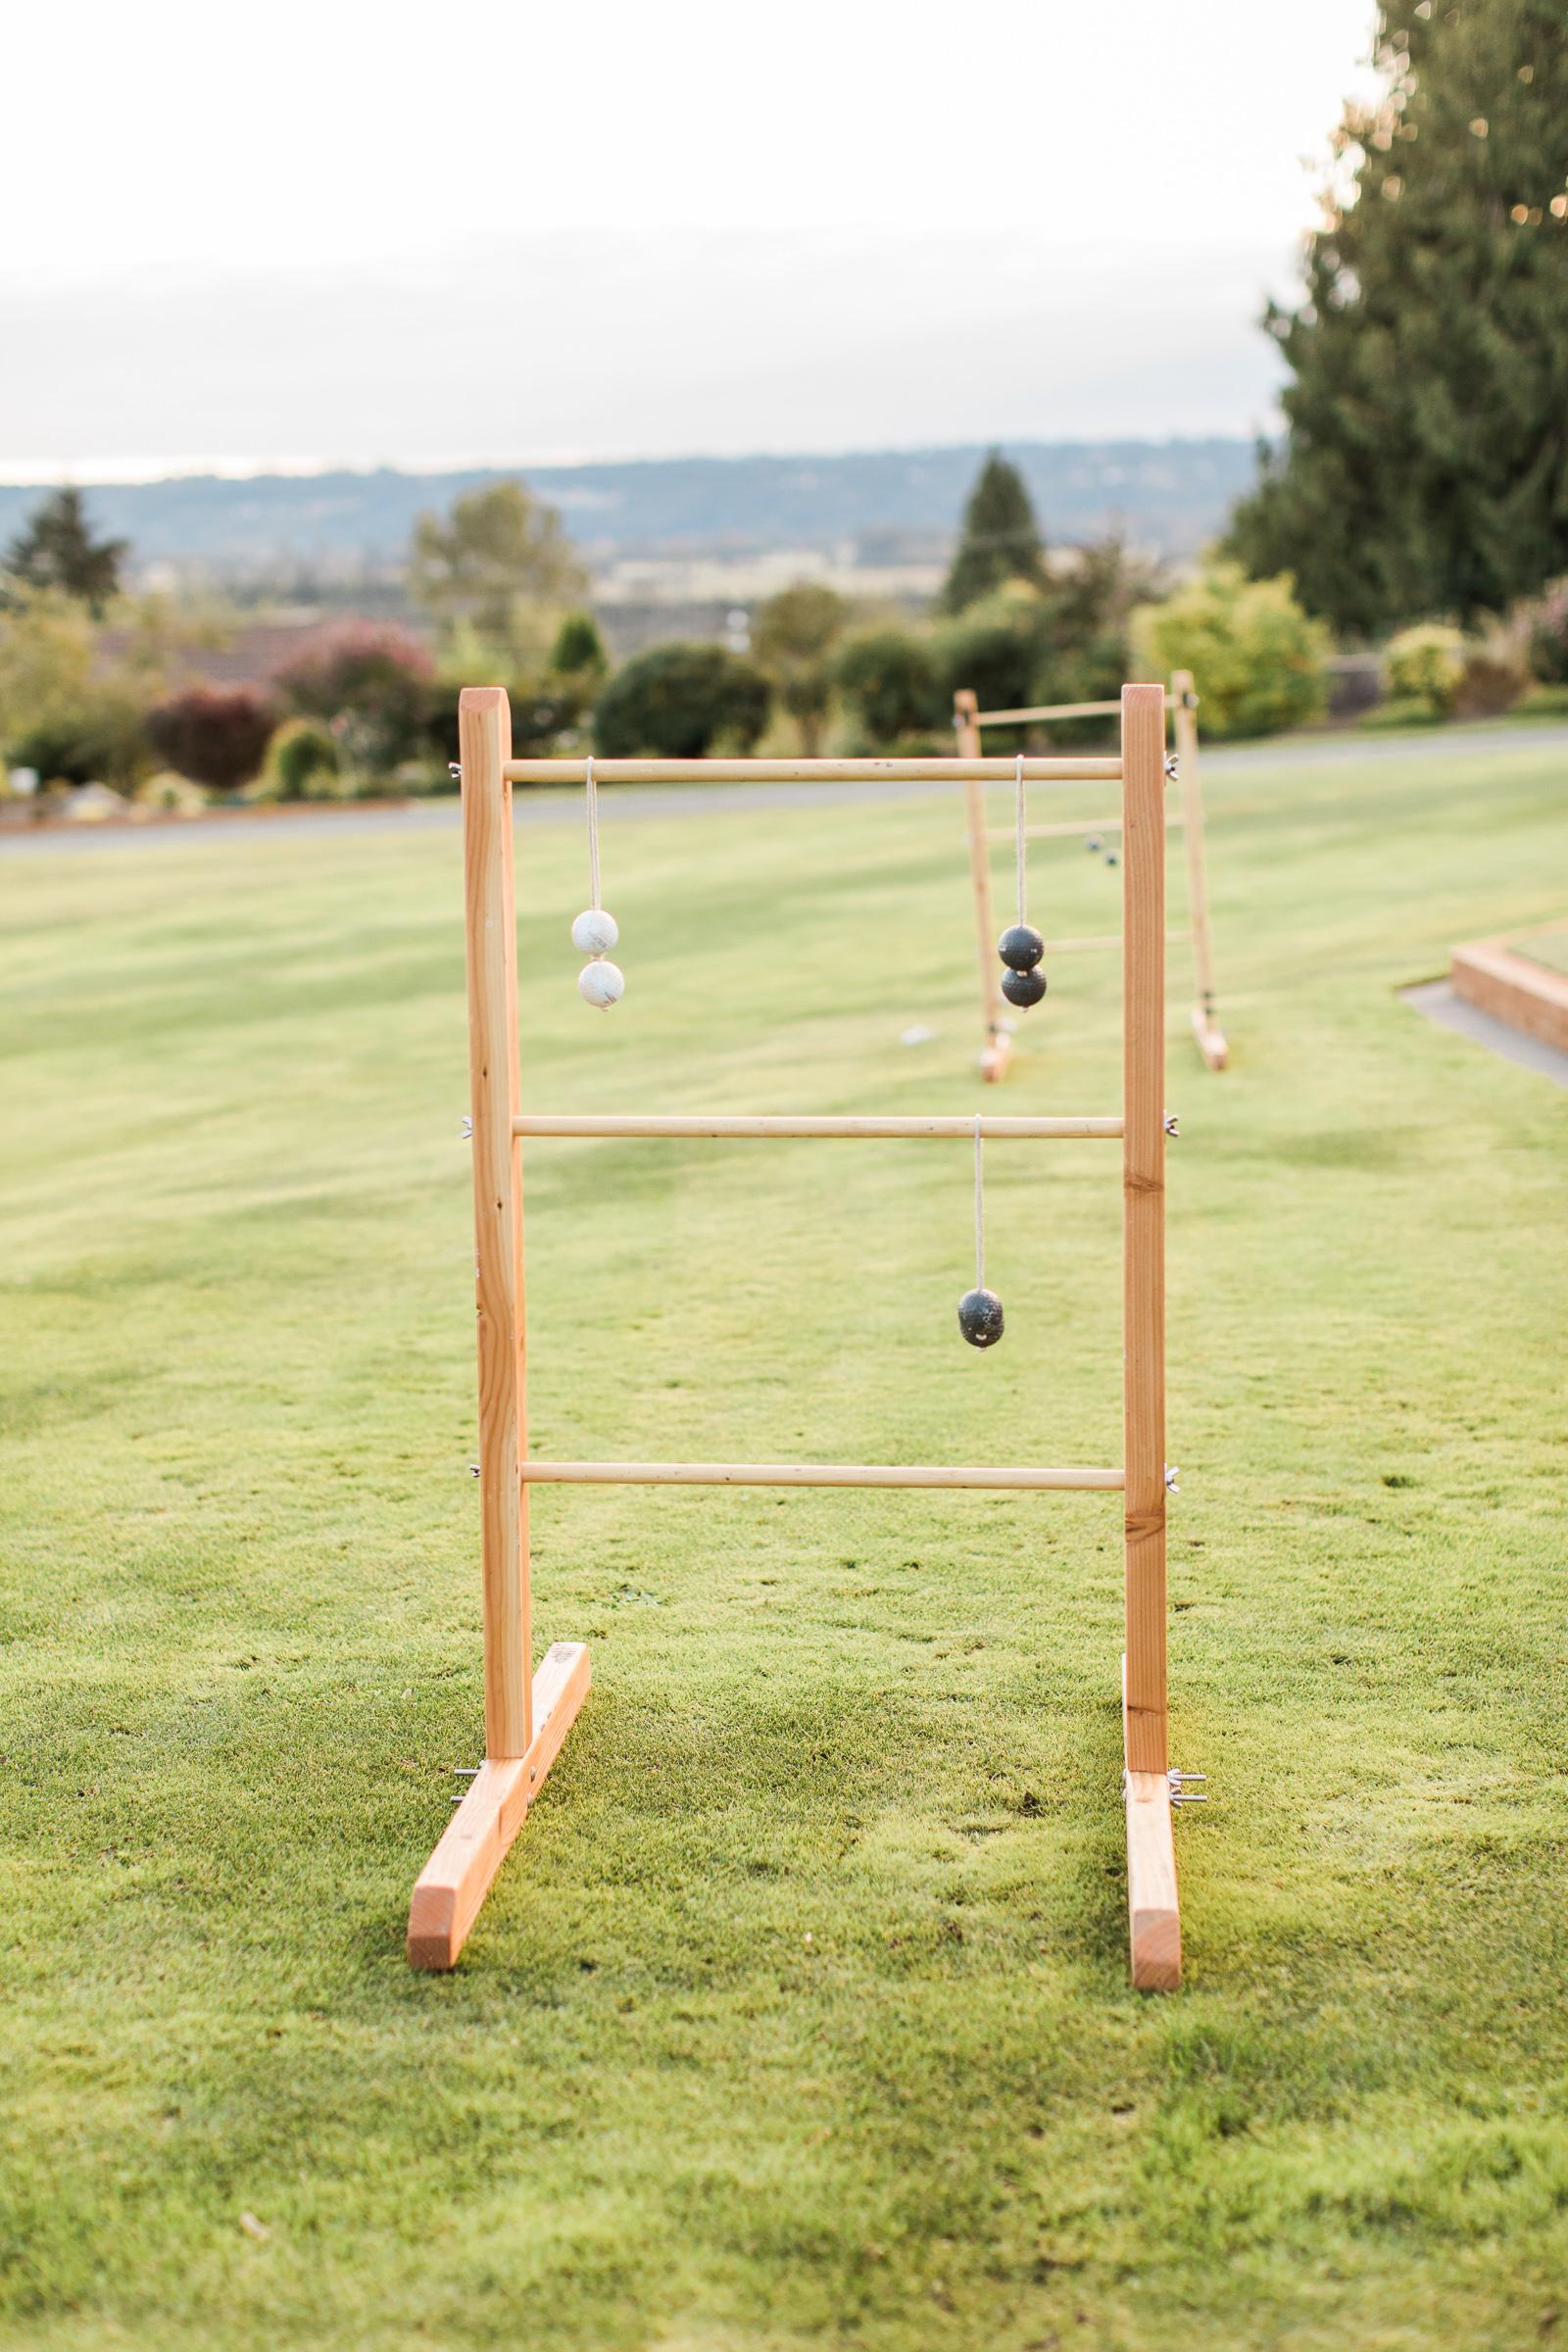 Ladder-Toss-Yeti-Yard-Game-Rentals.jpg